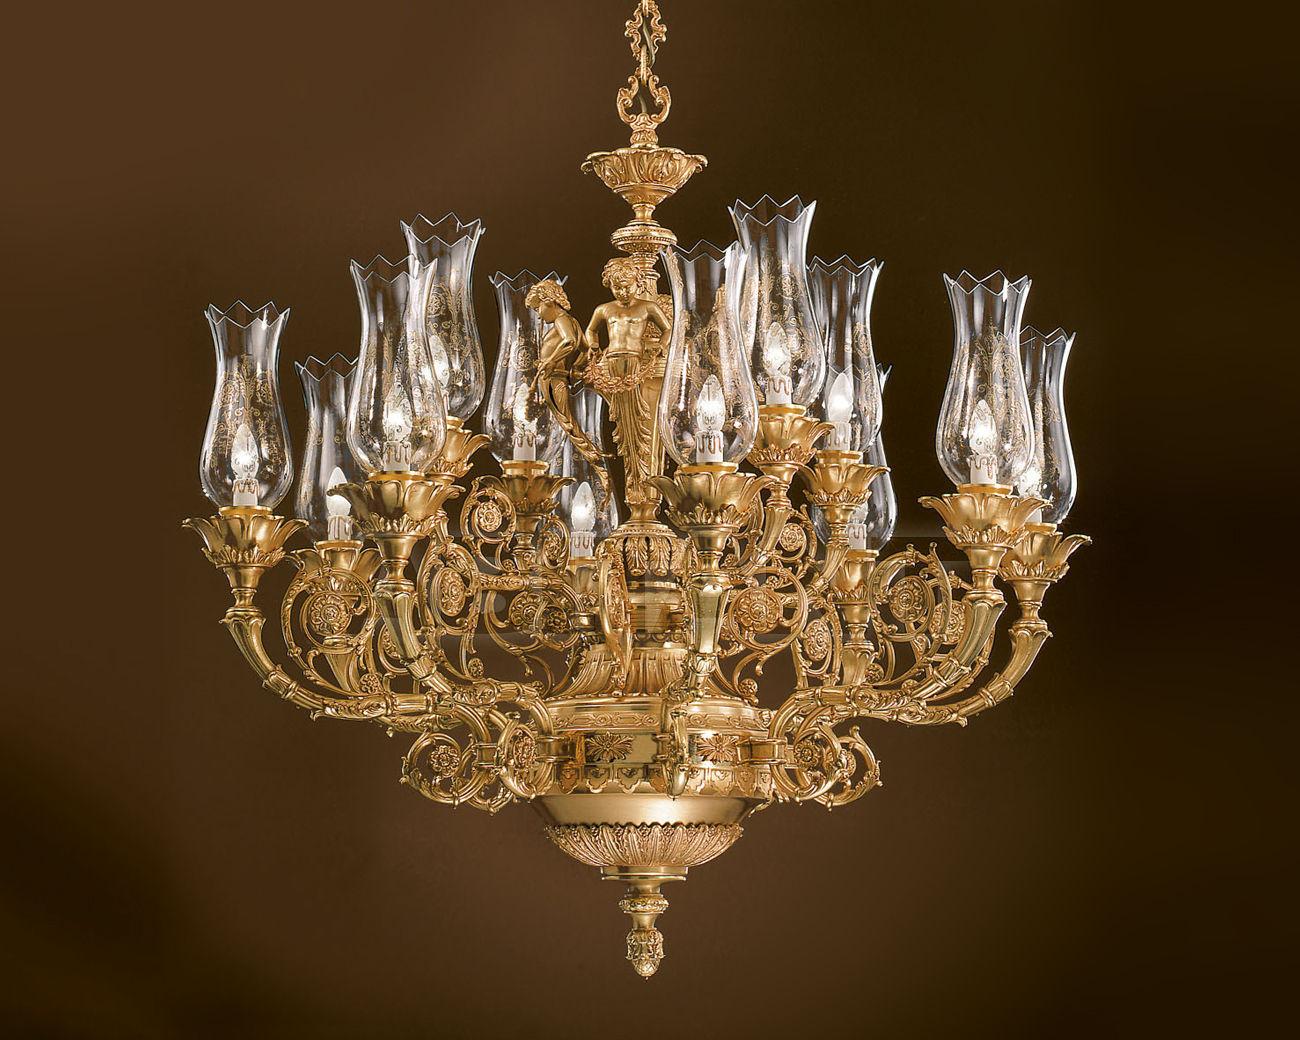 Купить Люстра F.B.A.I. Candeliere 4223/8+4